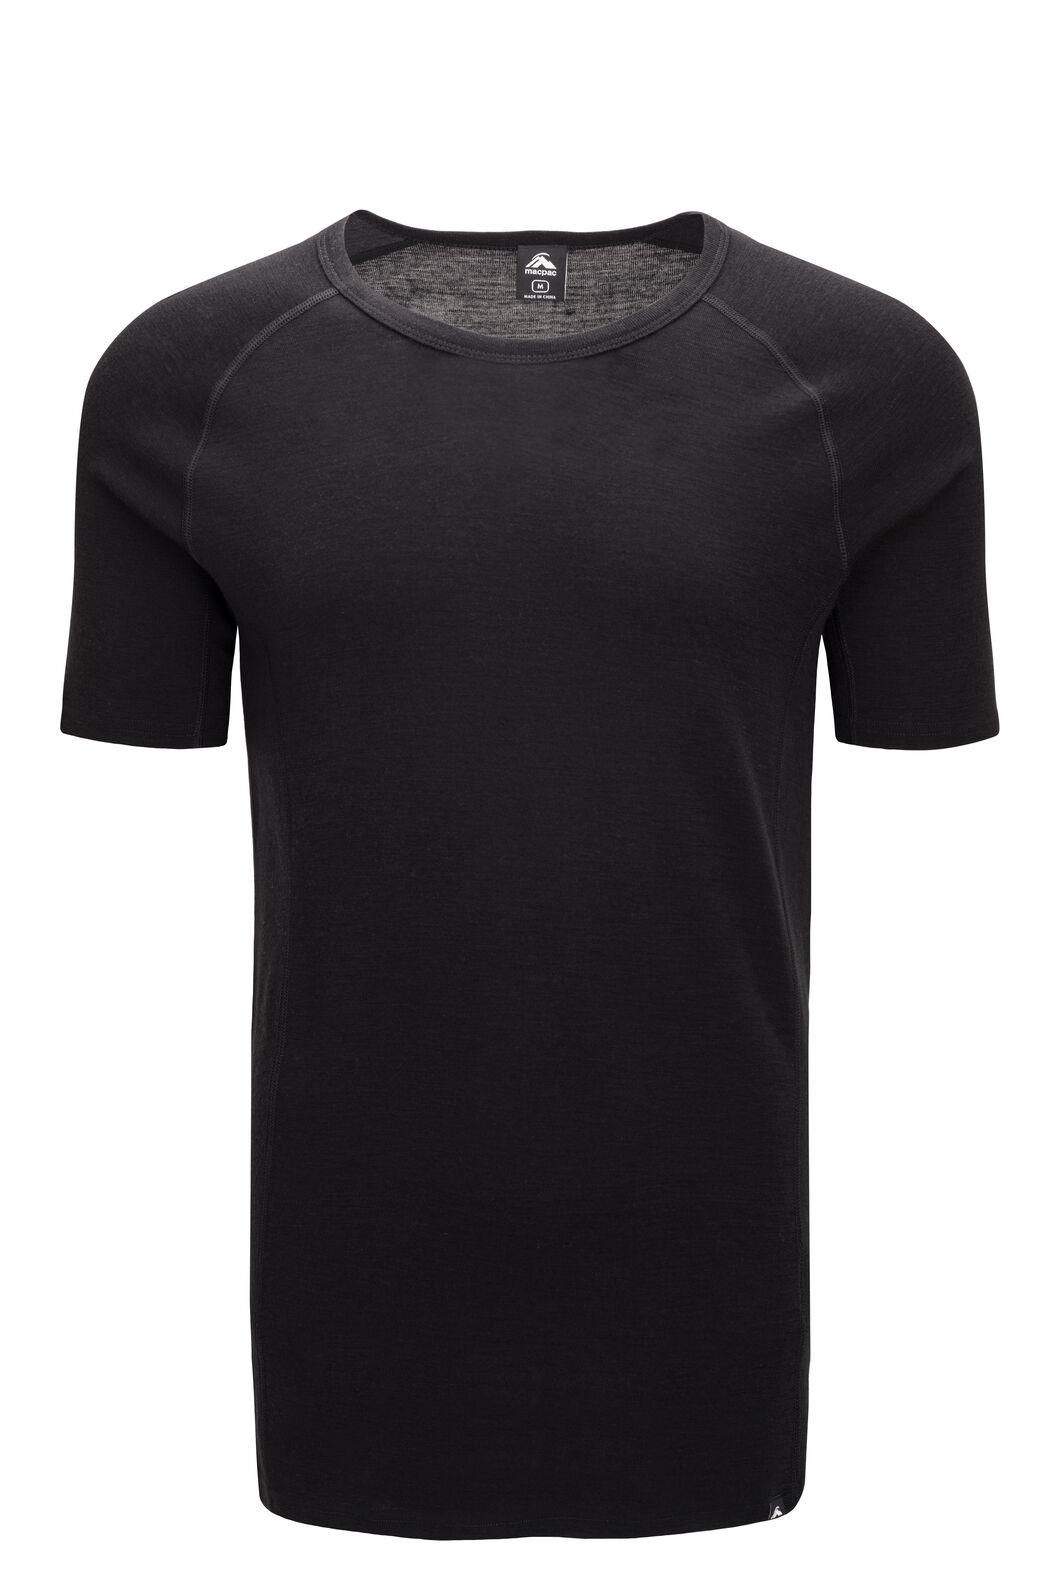 Macpac Men's 220 Merino Short Sleeve Top, Black, hi-res